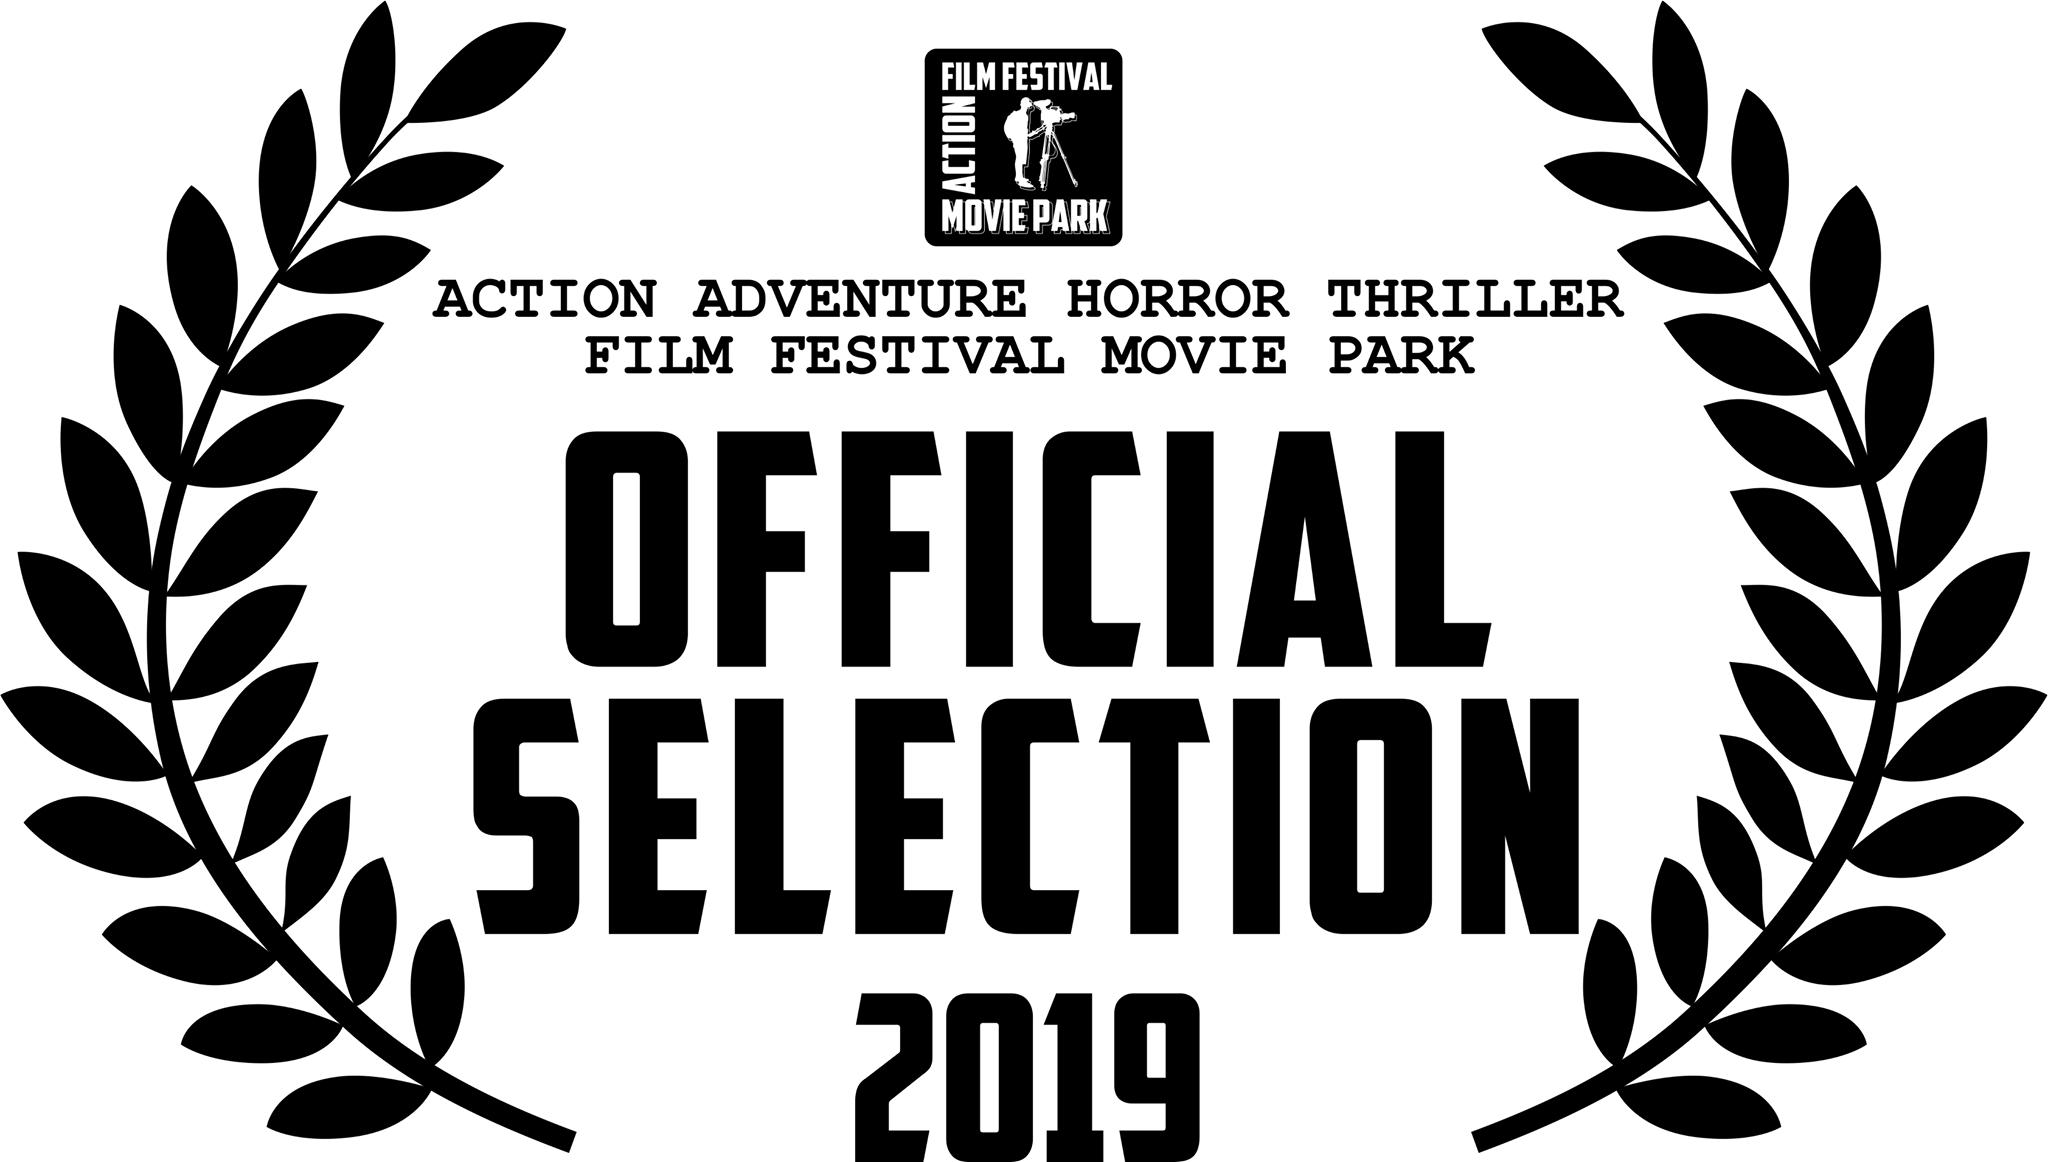 action-horror-thriller-fiction-adventure-film-festival-movie-park